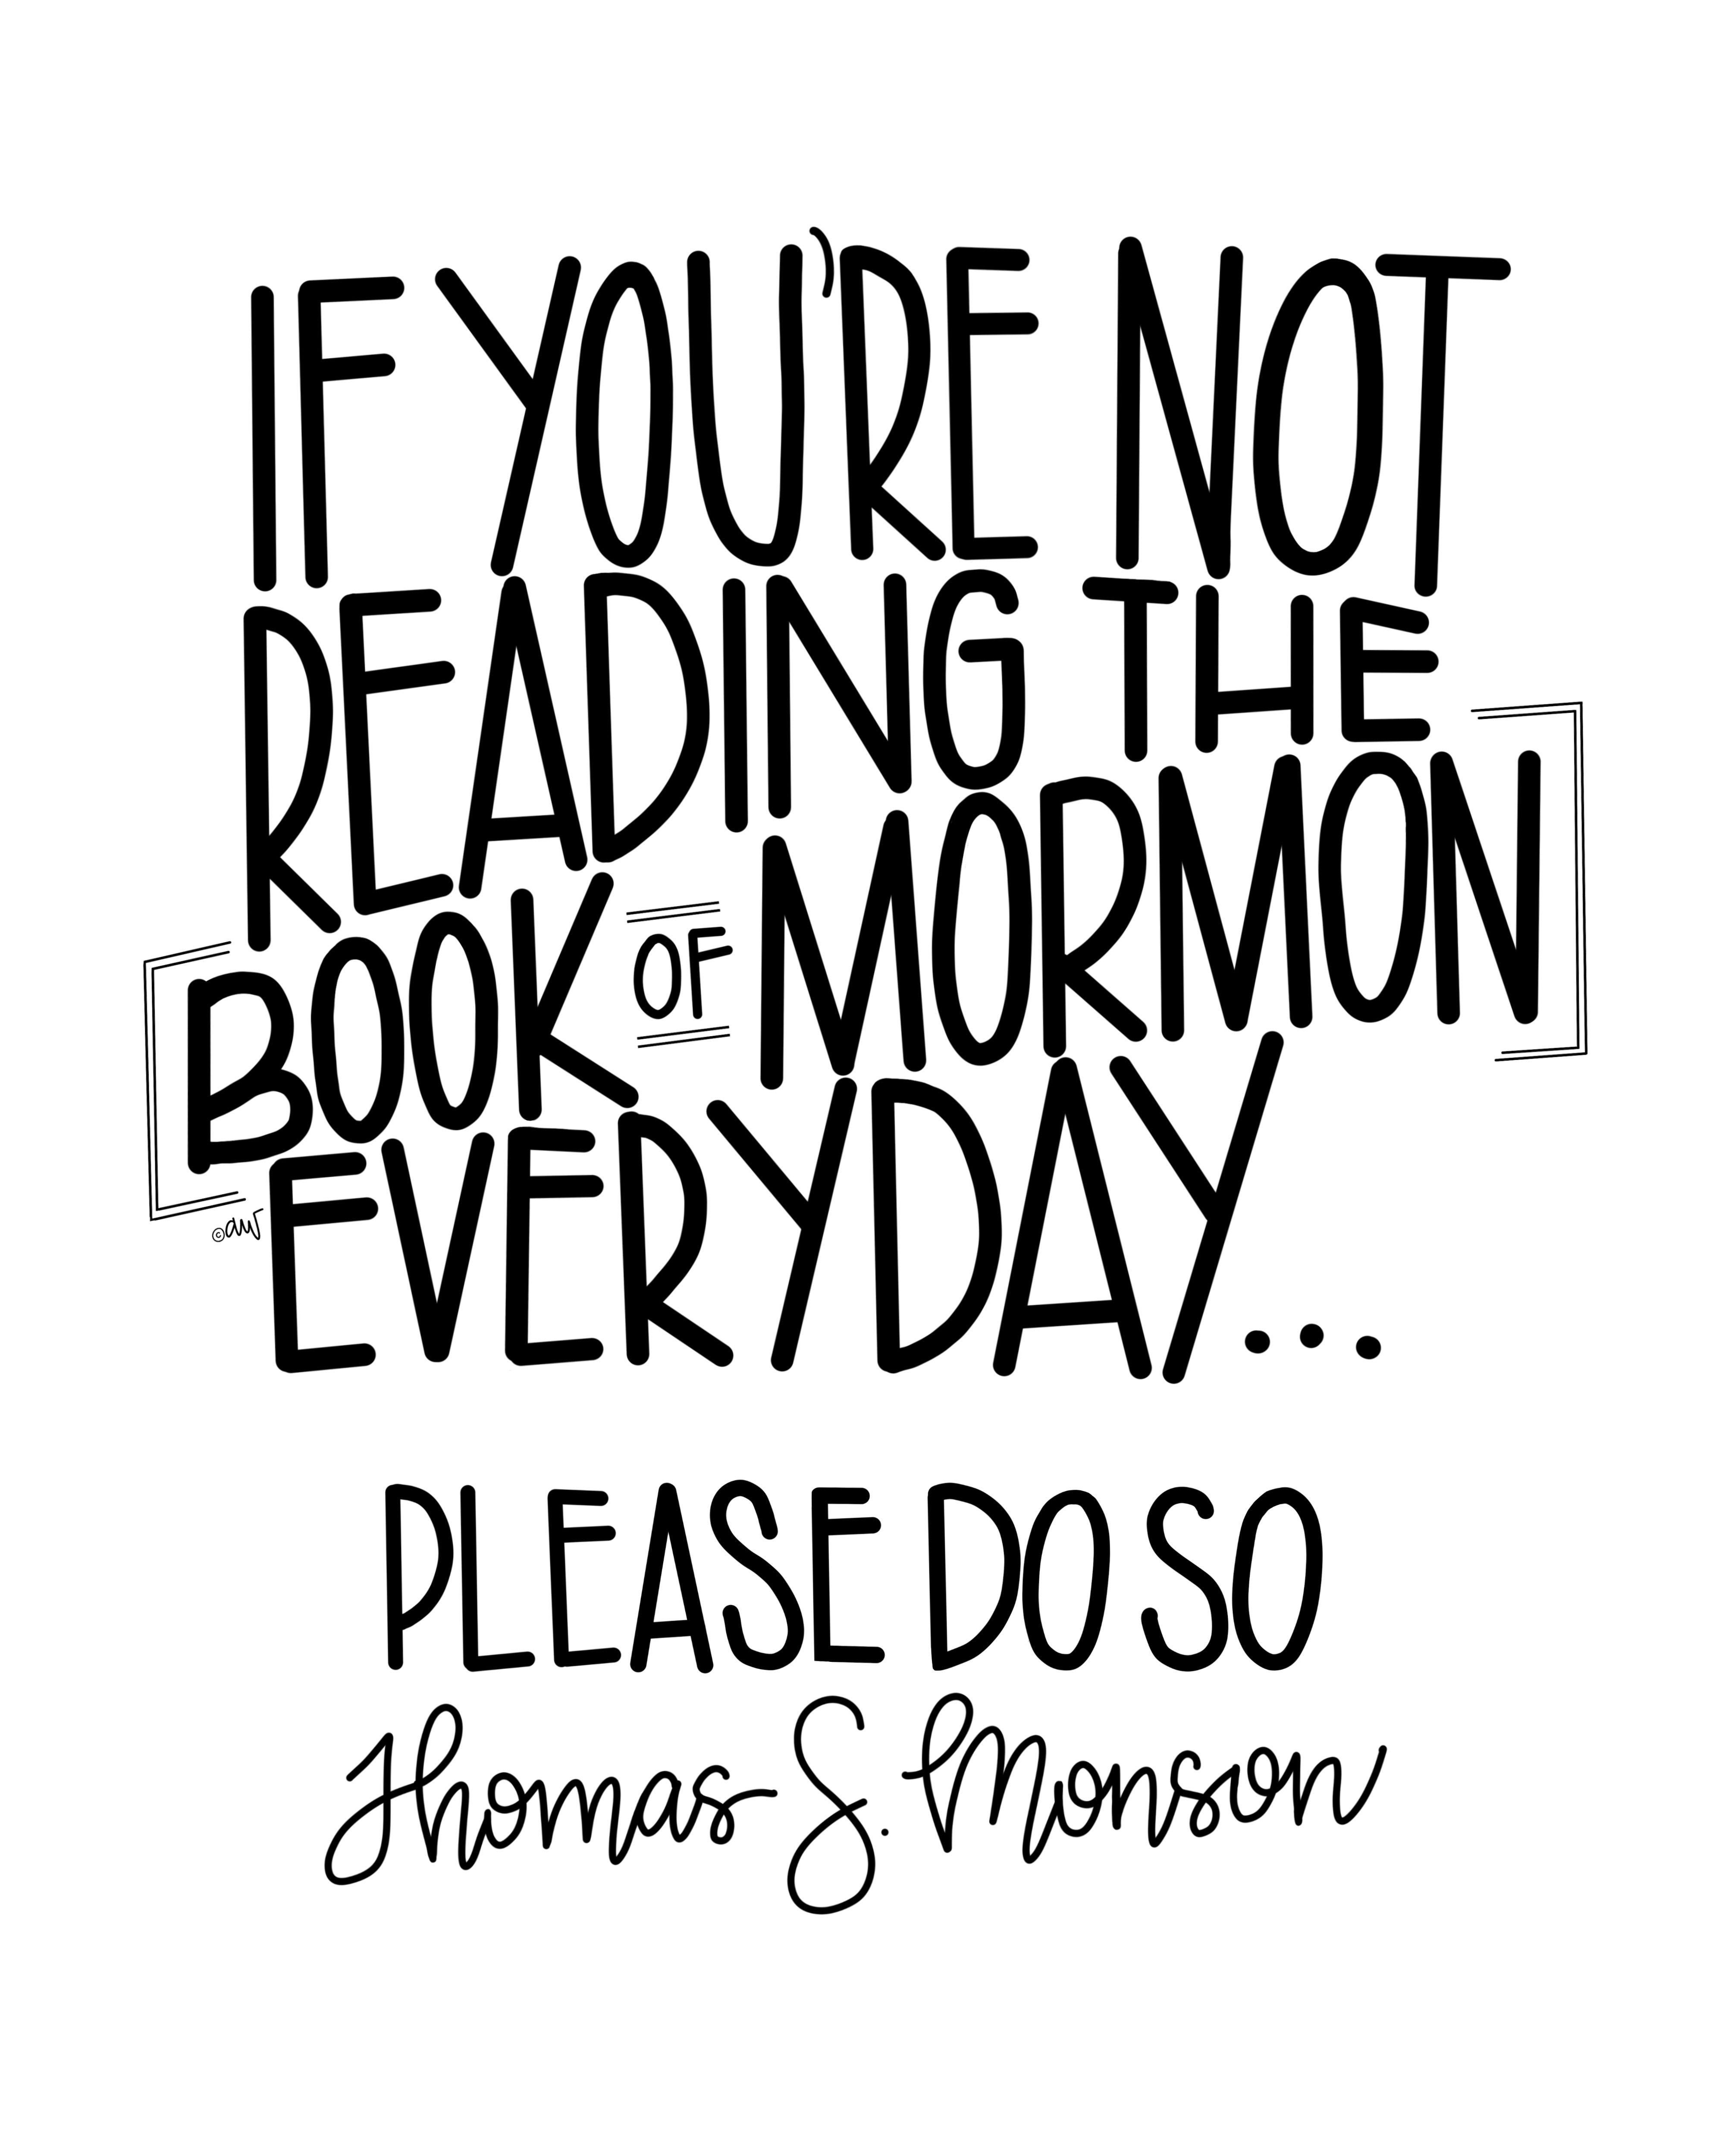 Book Of Mormon Quotes Impressive Tsmreadingeveryday 4000×5000 Pixels  Church  Pinterest . Design Inspiration